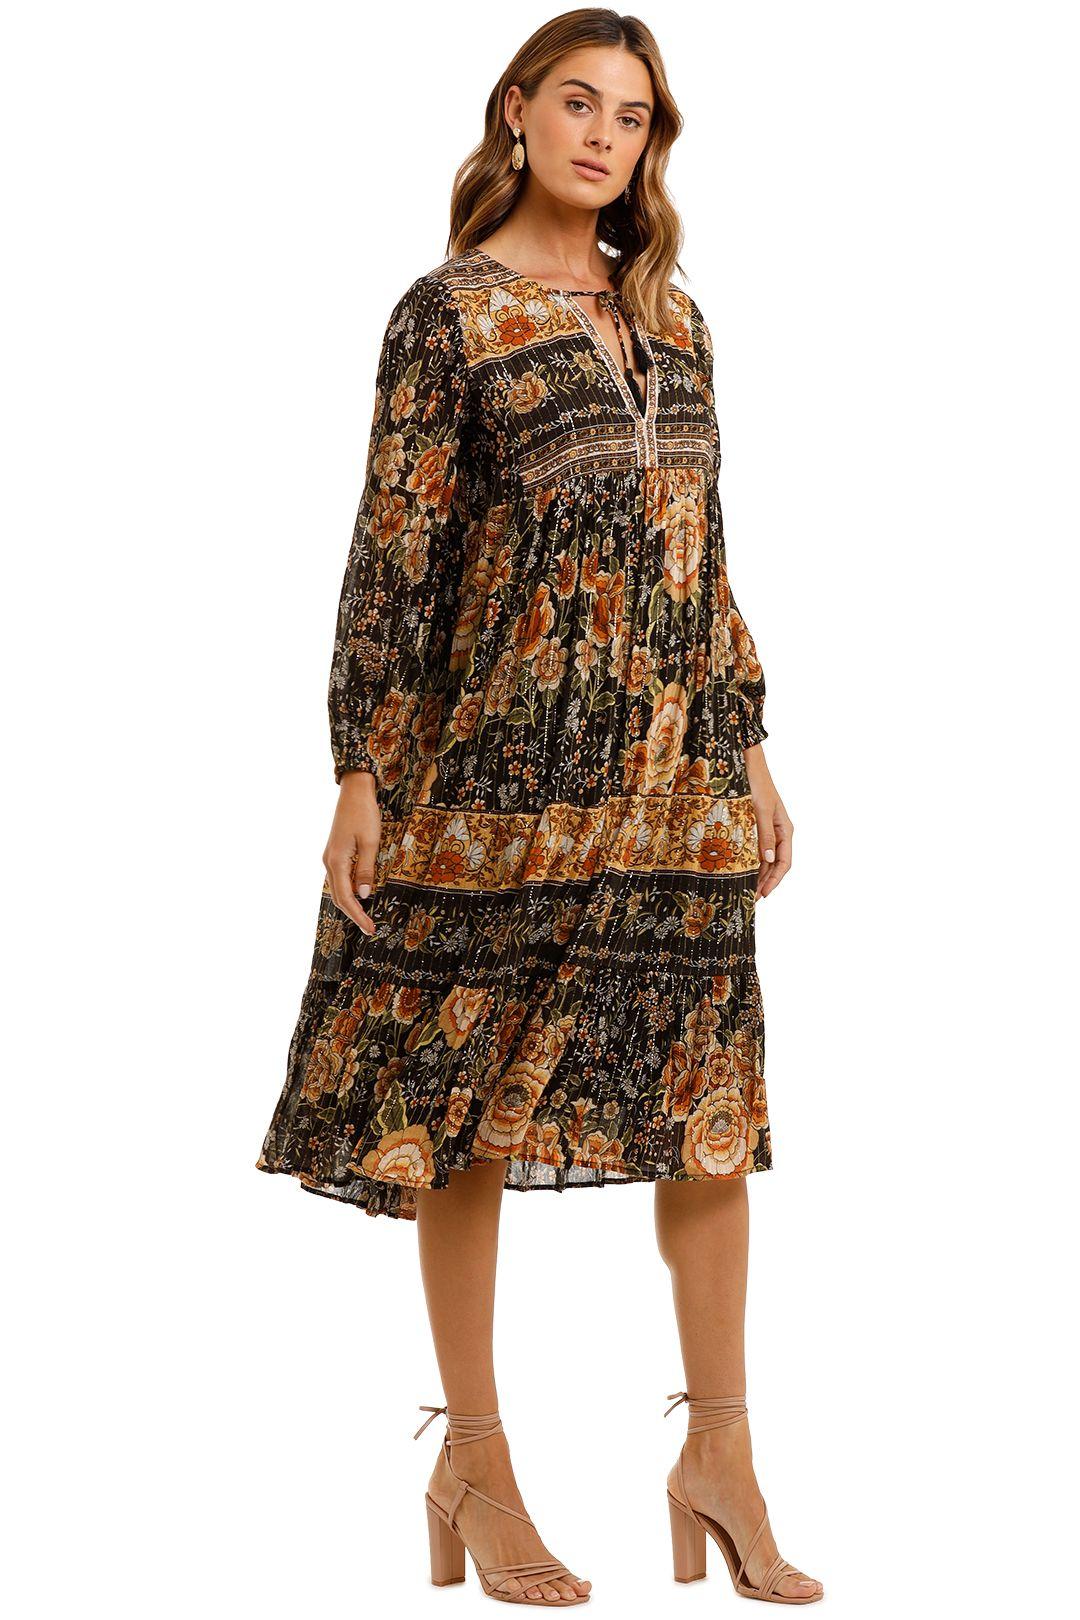 Spell Mystic Boho Dress Nightfall Boho